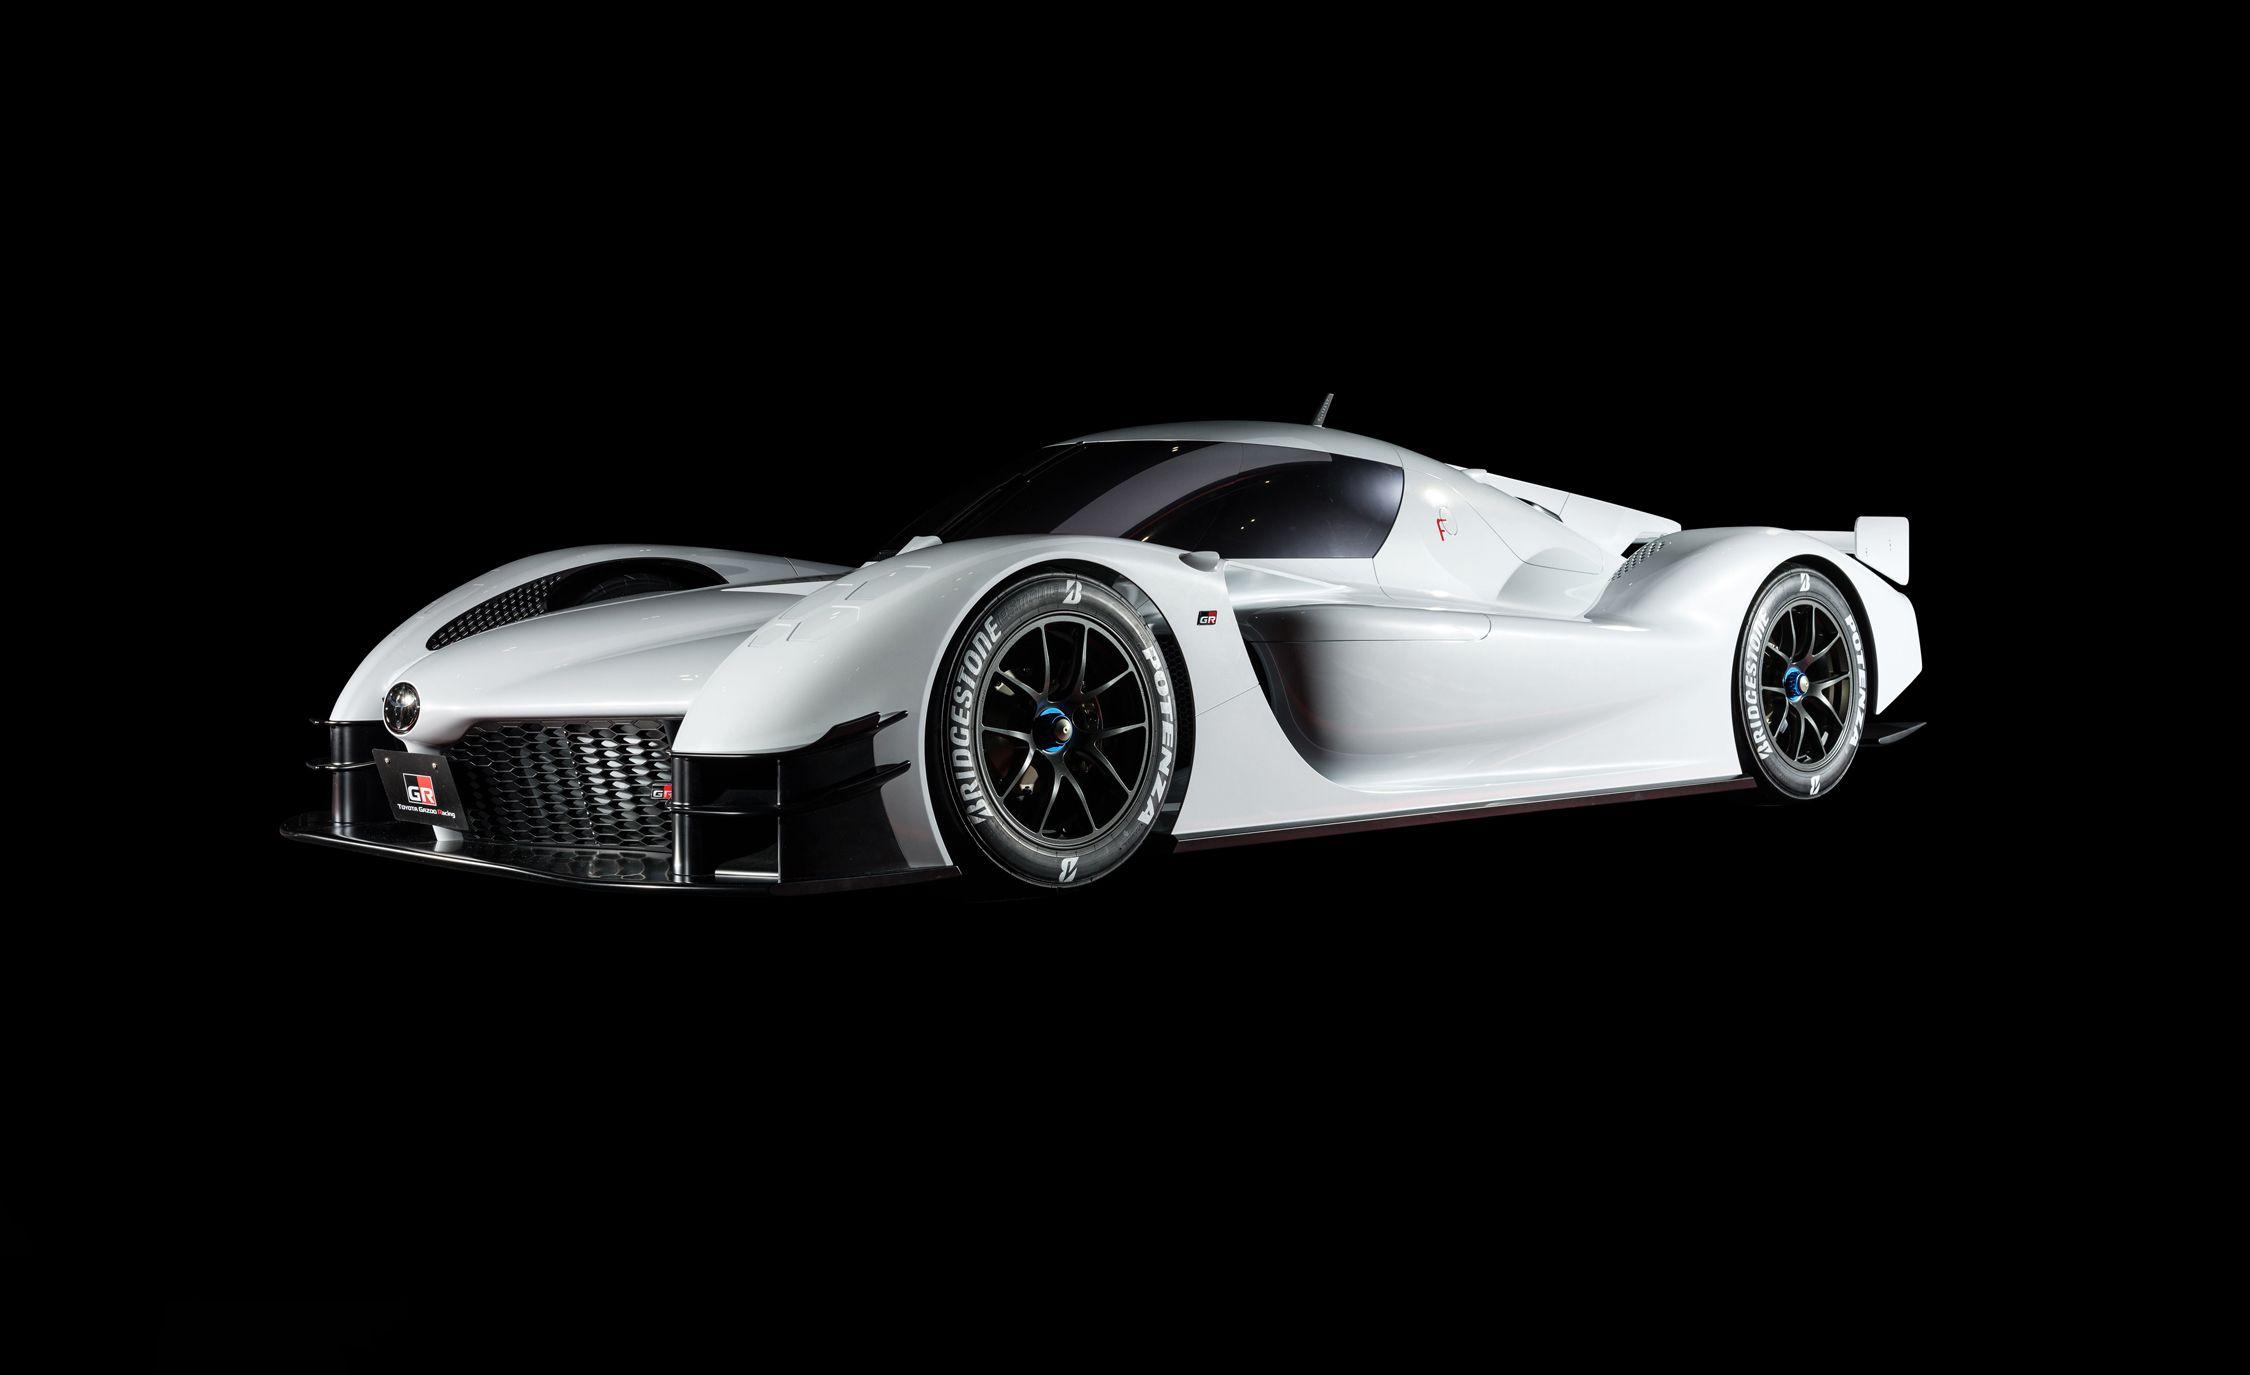 Toyota Gr Super Sport Concept Previews A Future Supercar News Lincoln Car And Driver